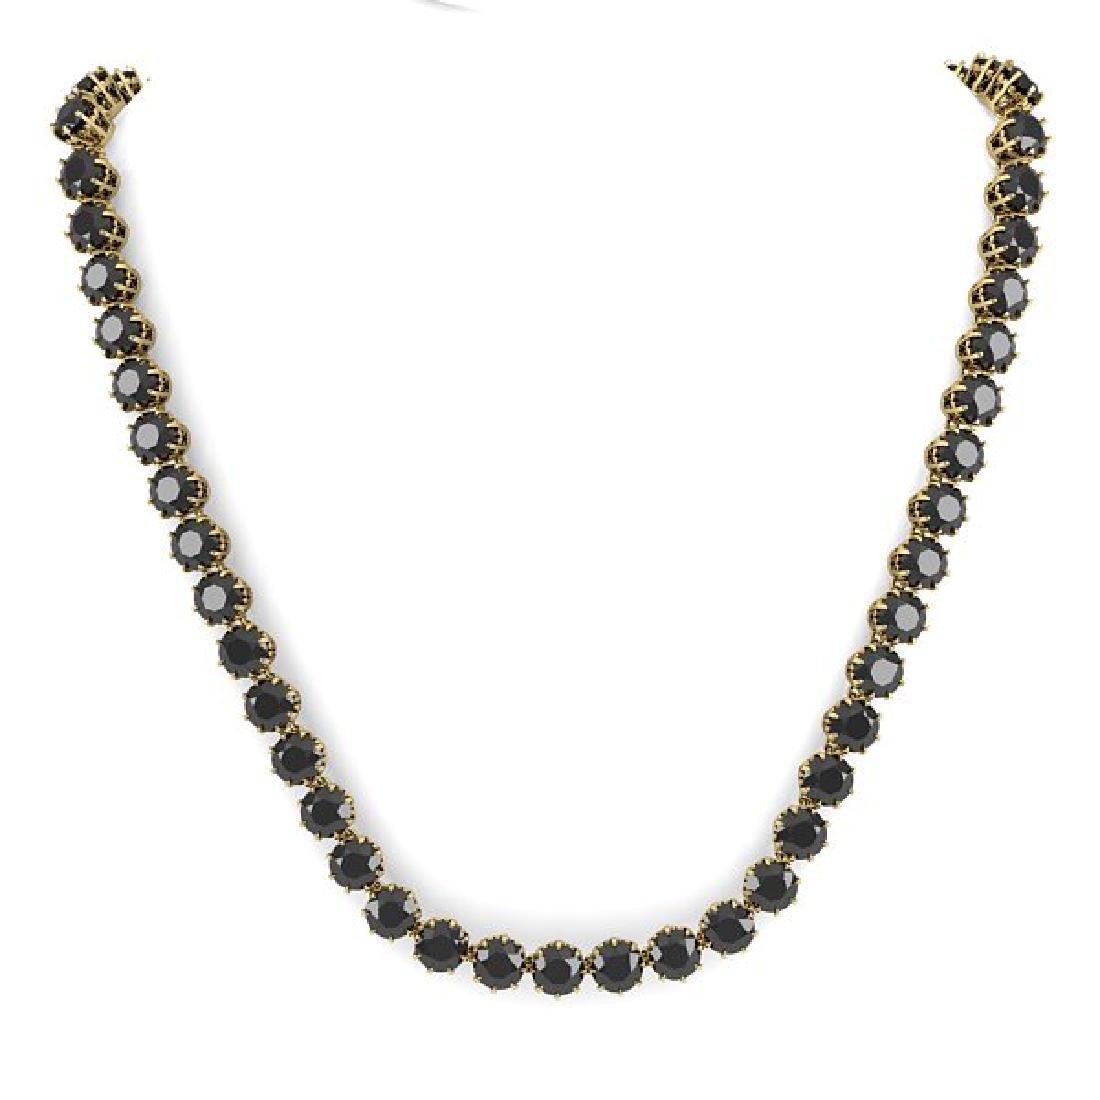 34 CTW Certified Black VS Diamond Necklace 14K Yellow - 3